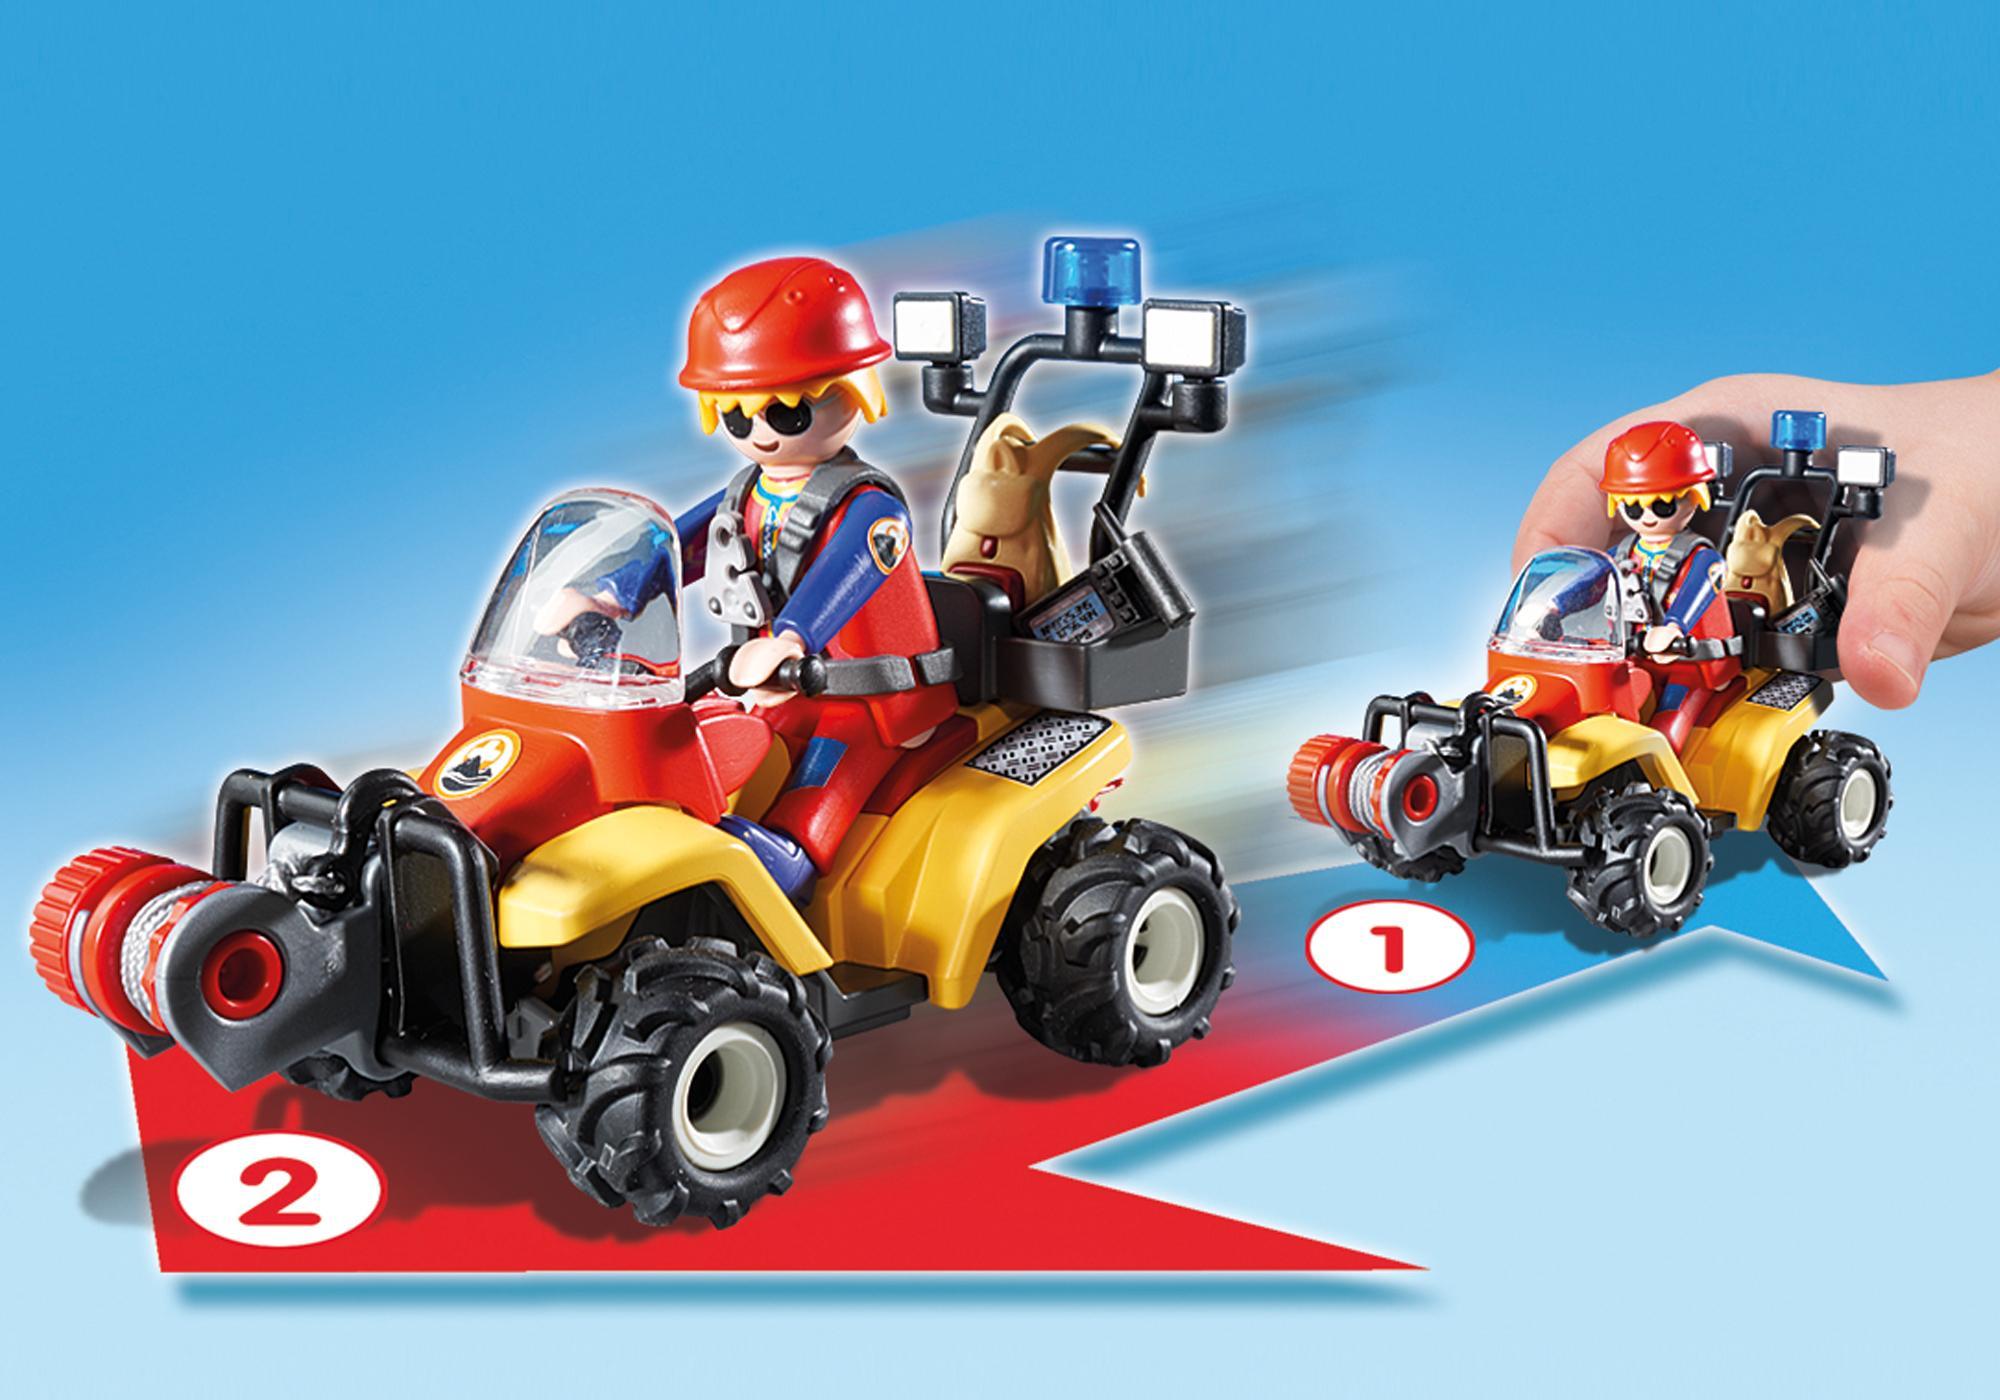 http://media.playmobil.com/i/playmobil/9130_product_extra1